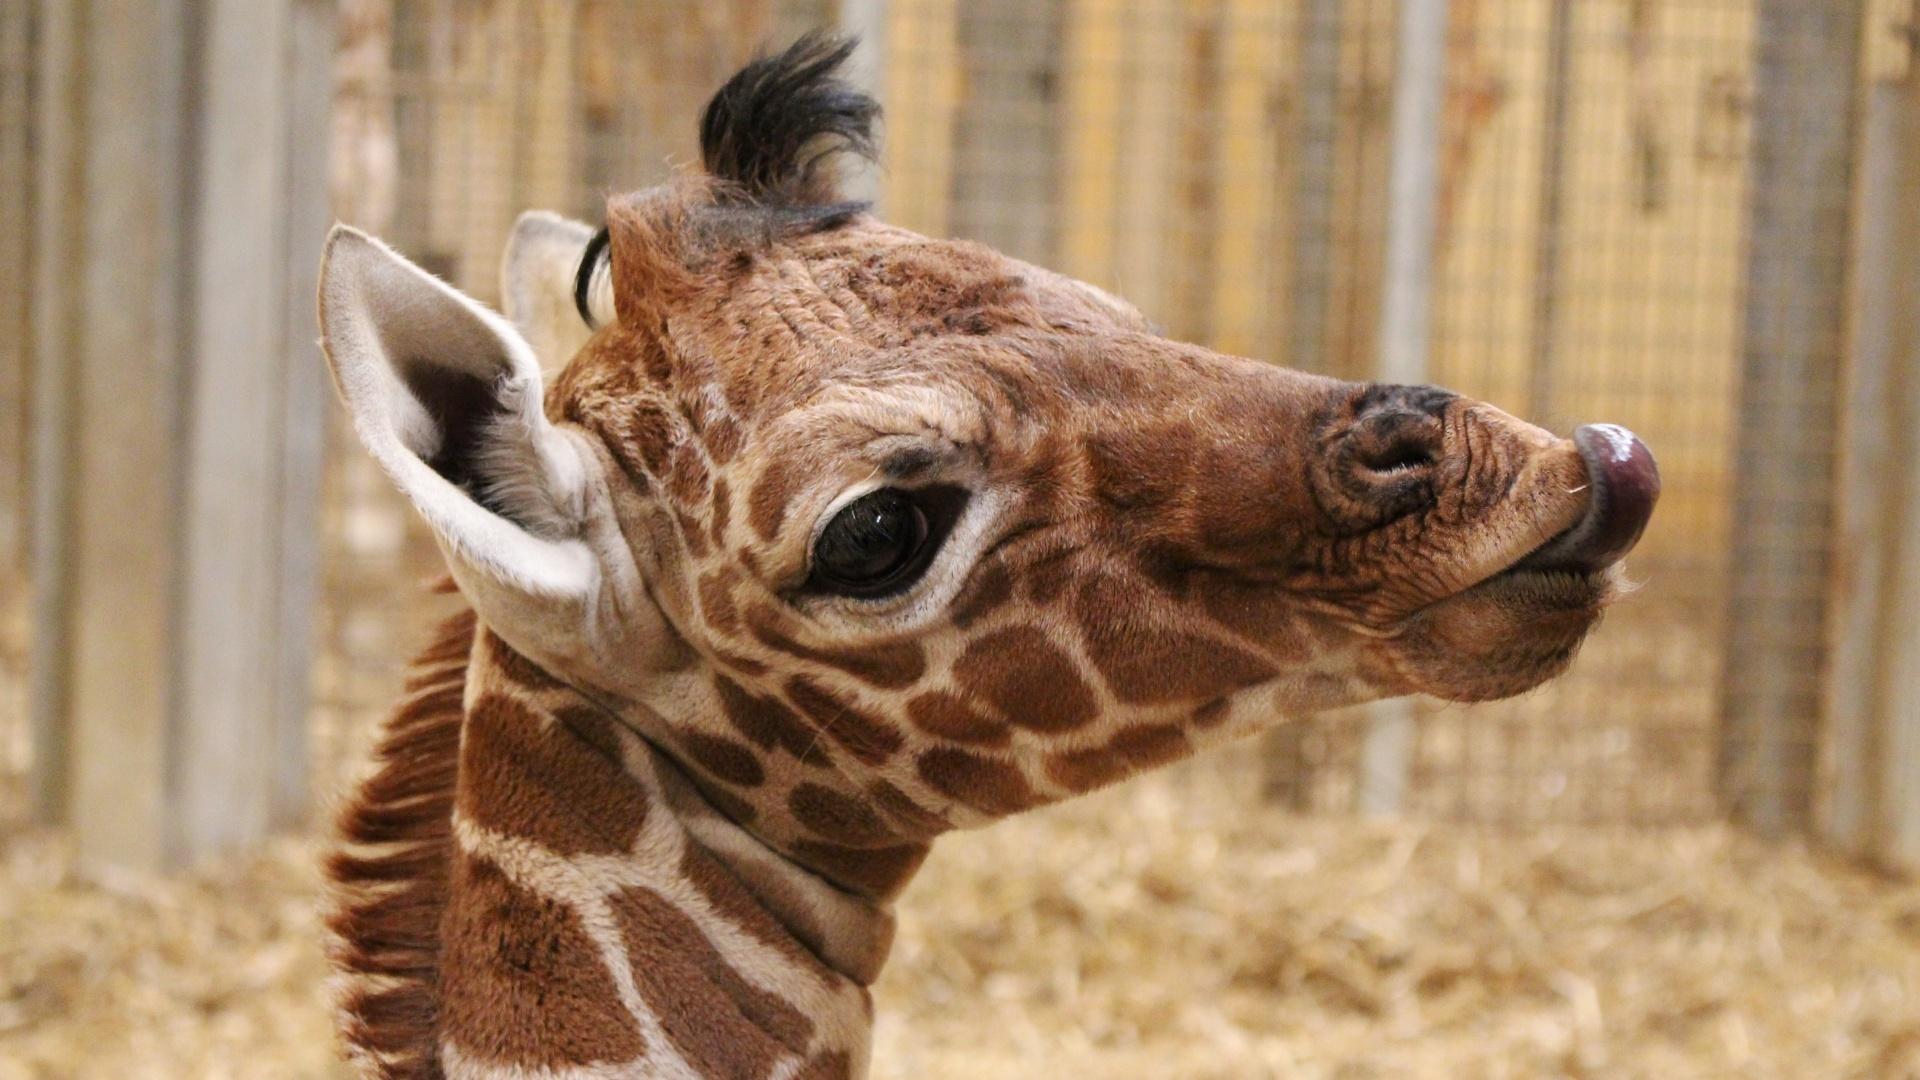 Baby giraffe sticks its tongue out